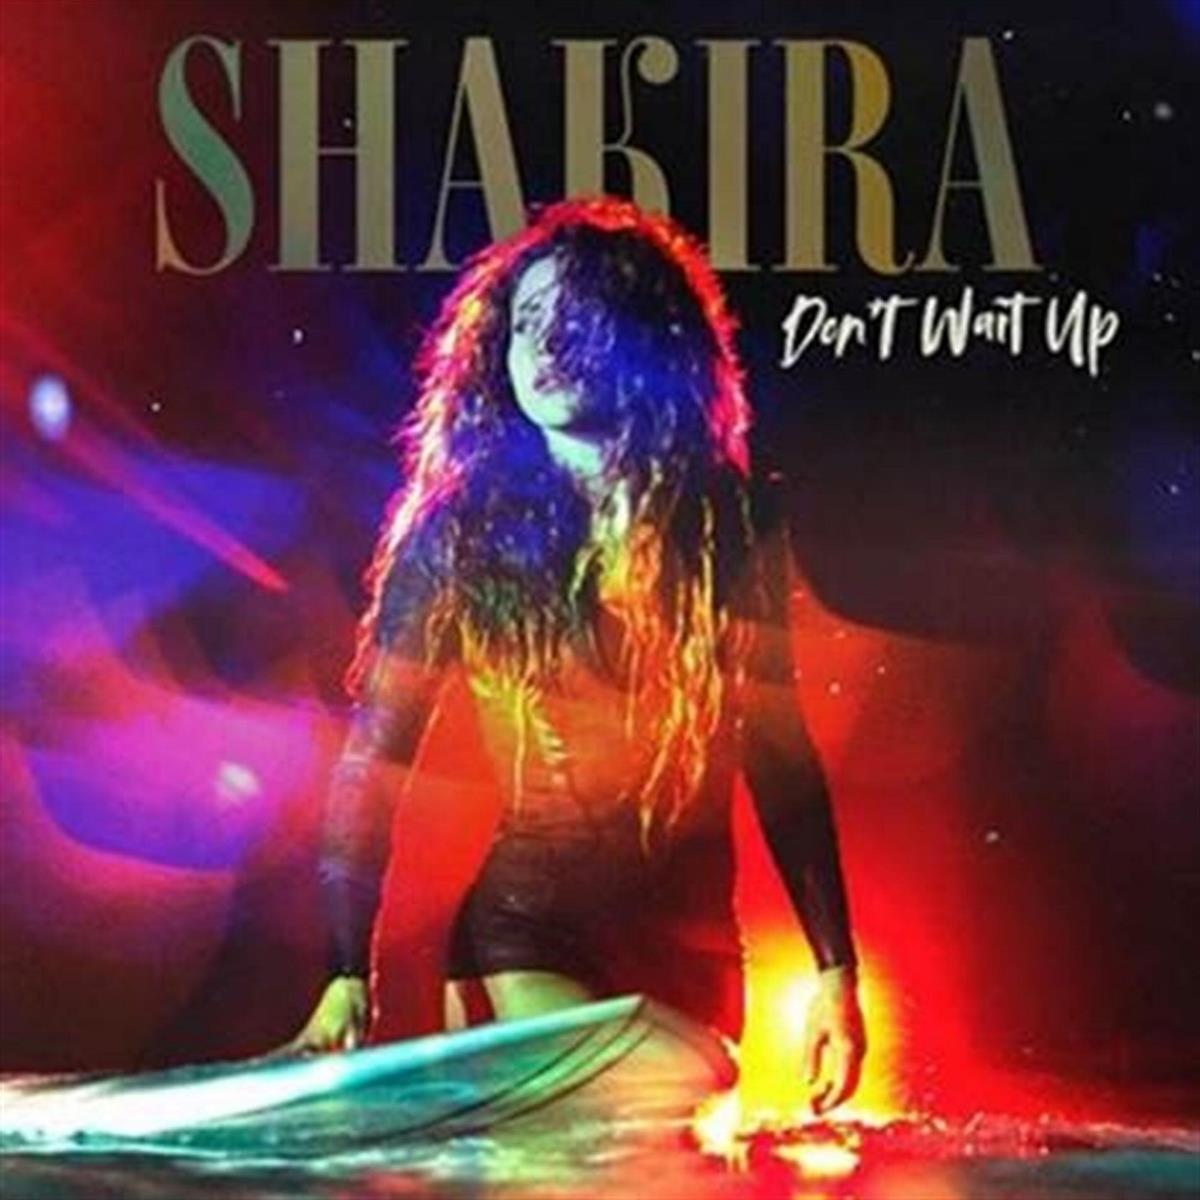 shakira nuevo